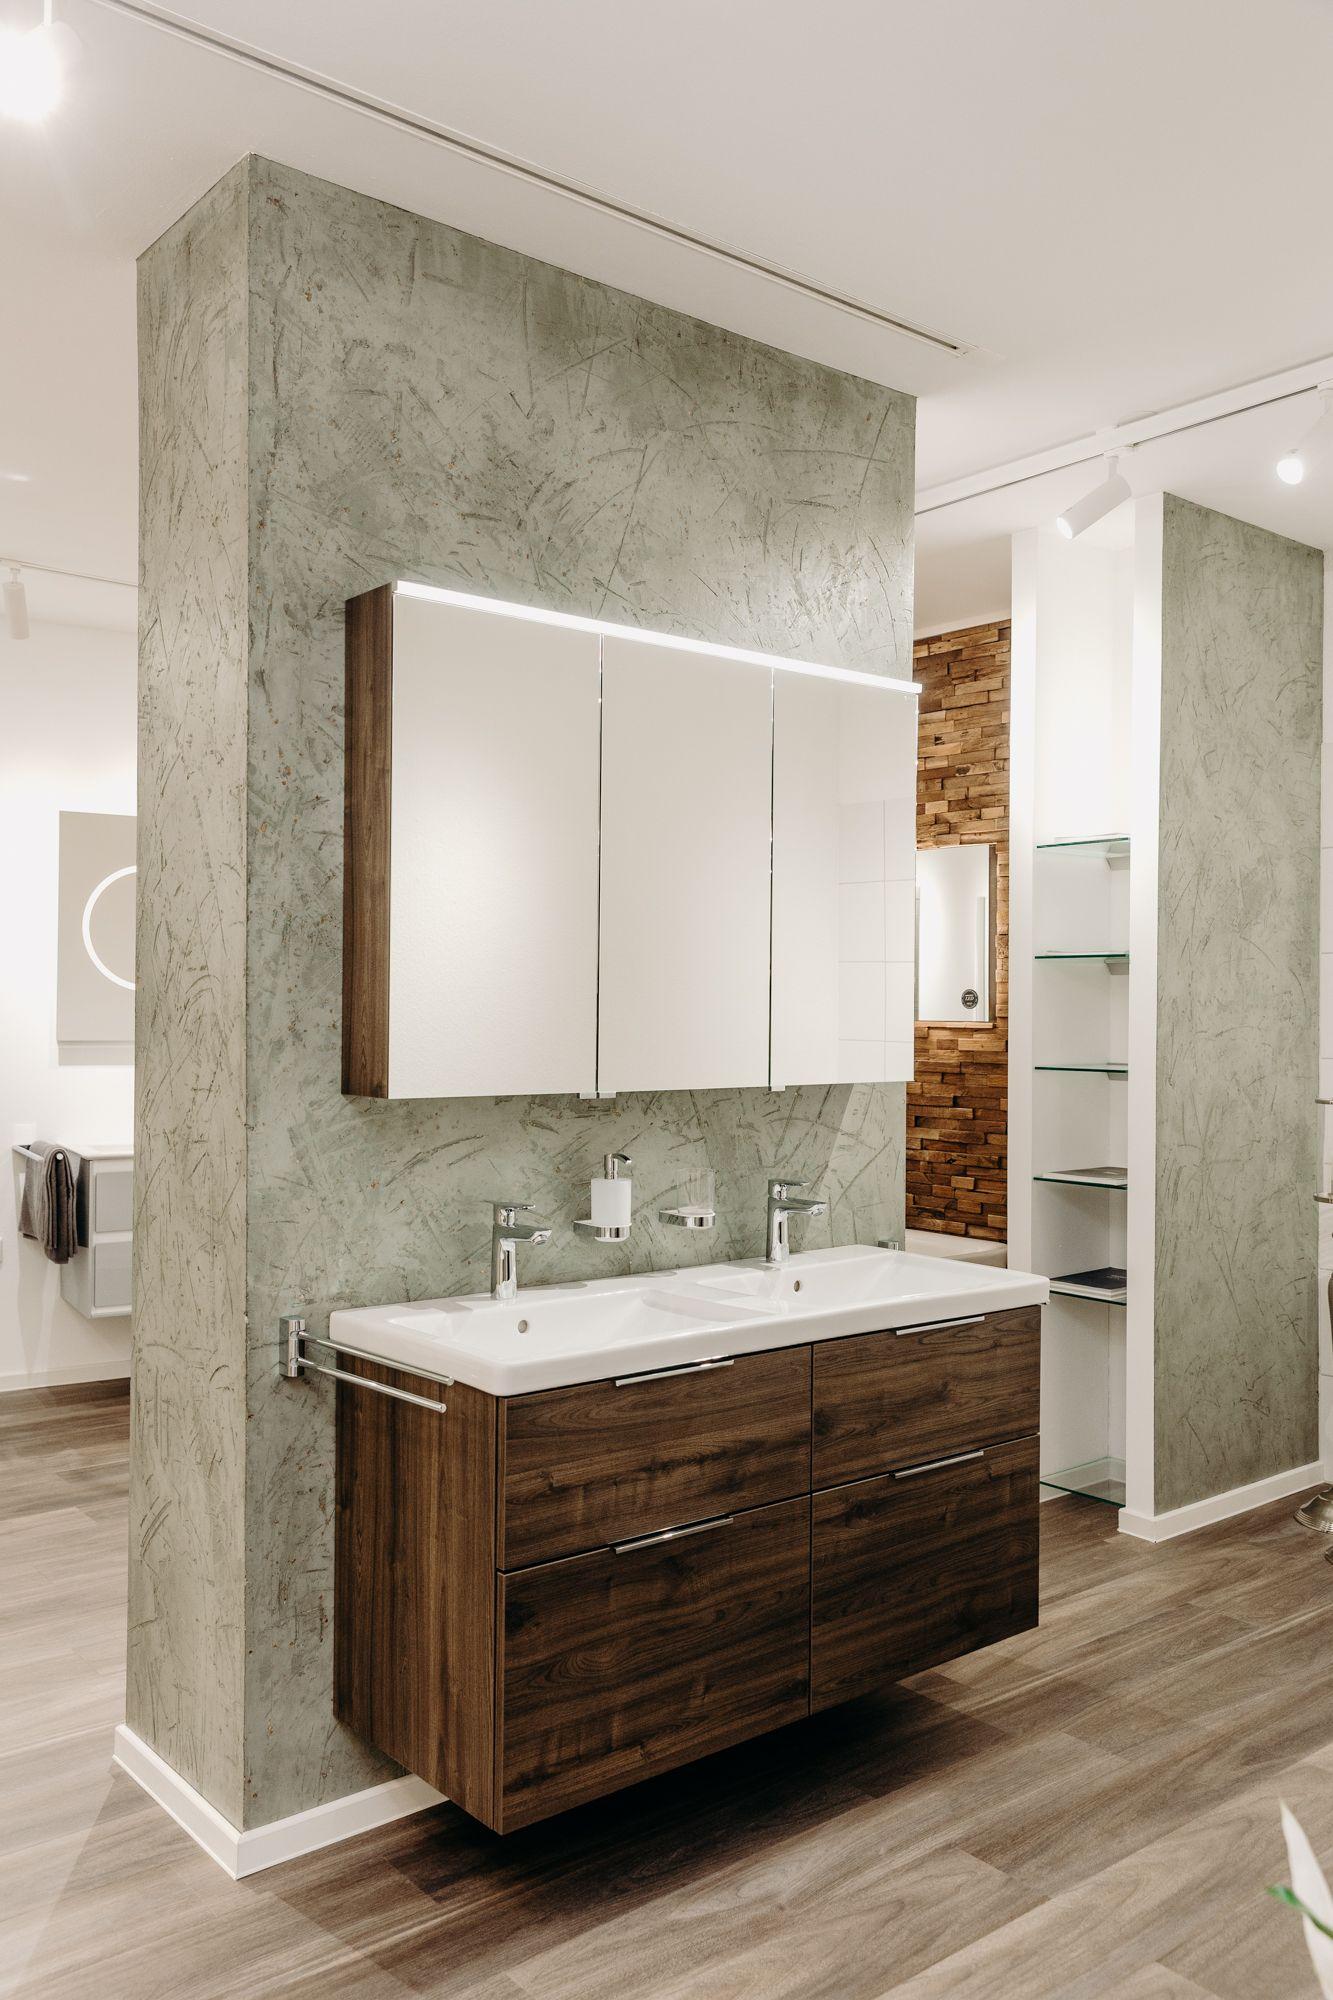 Spachteltechnik Im Badezimmer In 2020 Badezimmer Bad Badezimmerideen